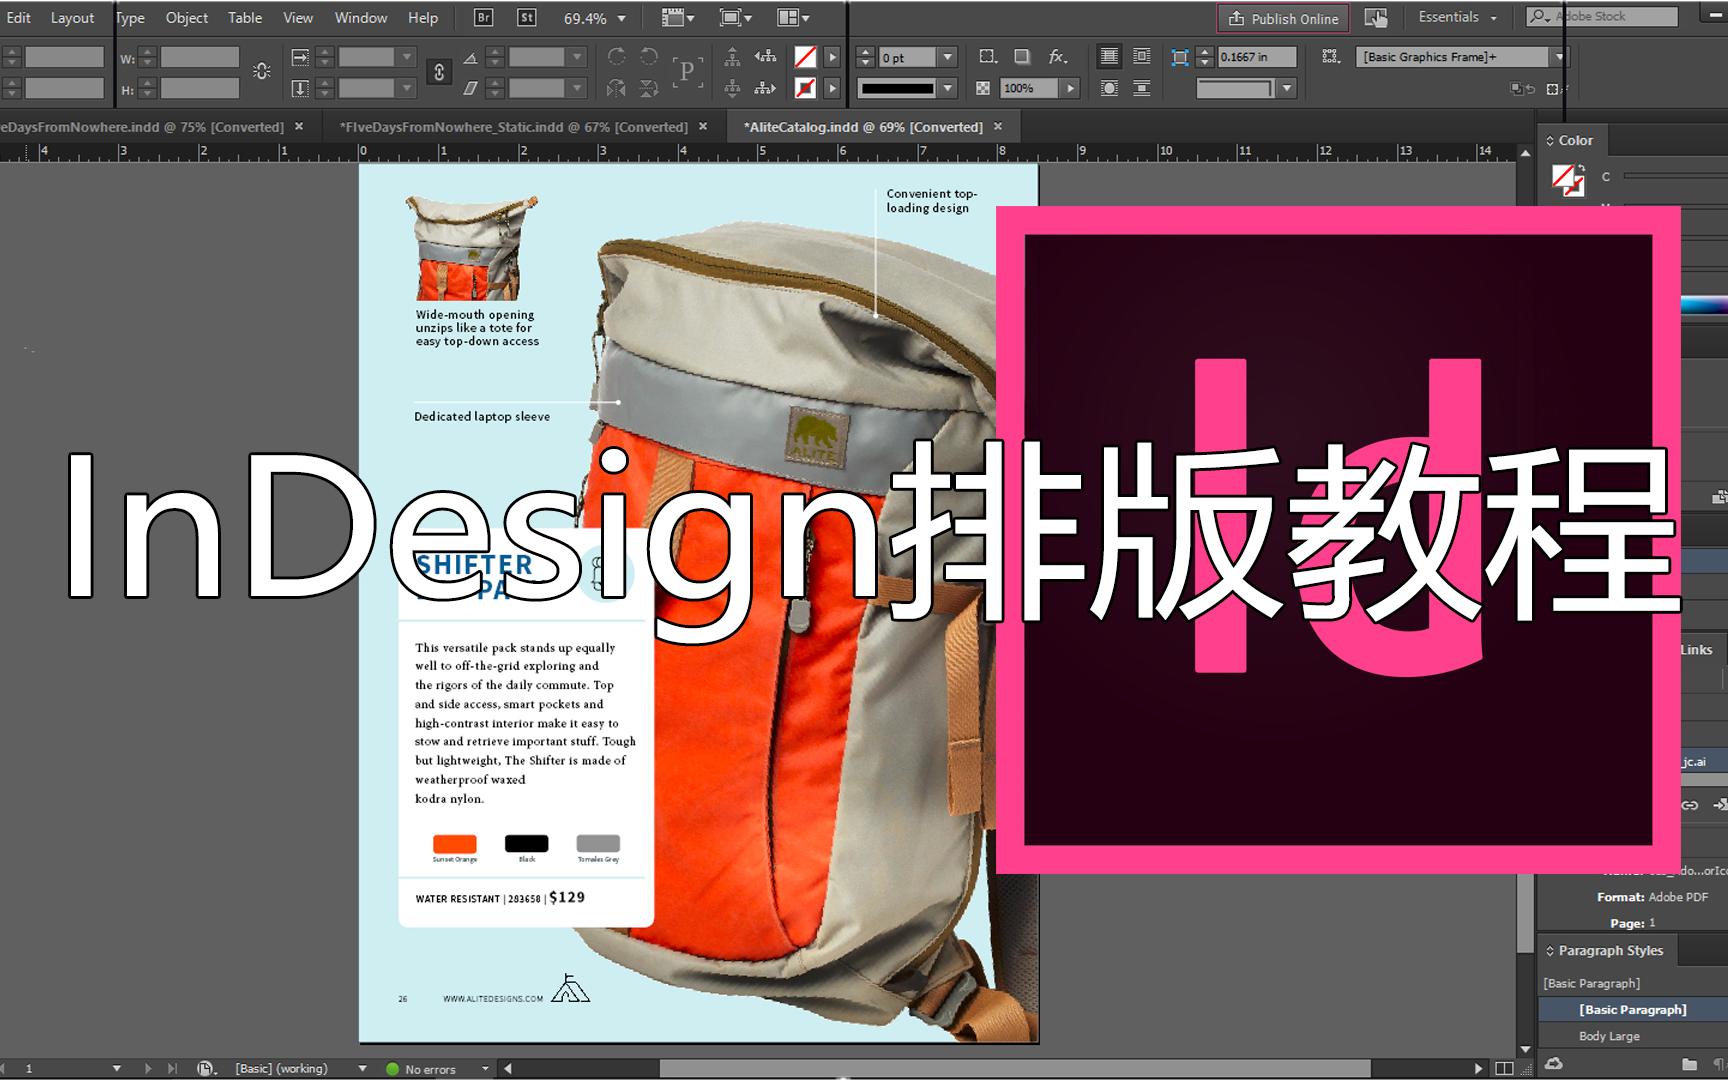 【indesign教程】indesign版式设计基础-第一套-有贴心字幕哦图片